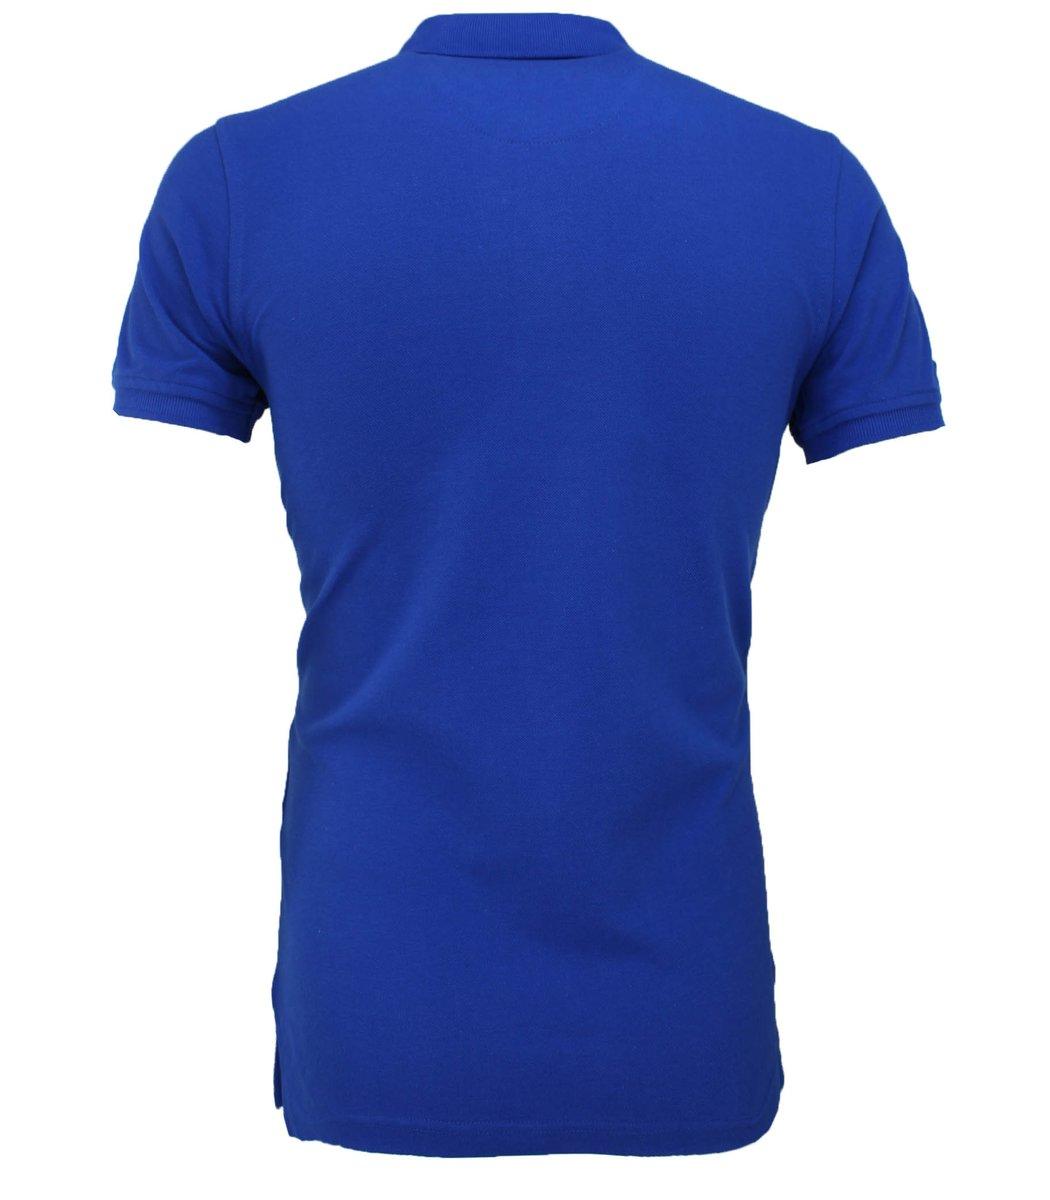 Синяя футболка поло Ralph Lauren RL3